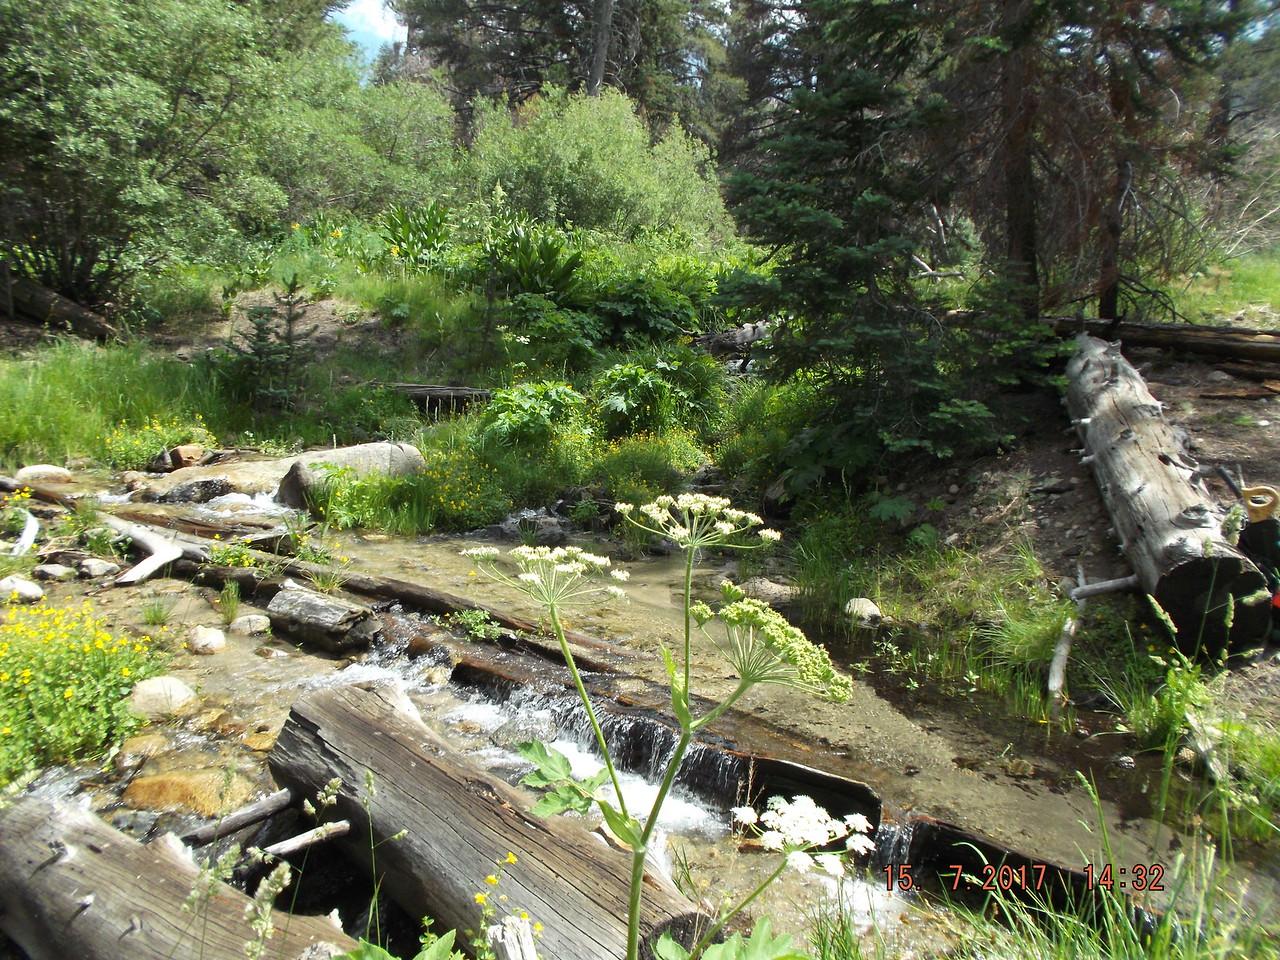 One of four streams through So. Fork Mdws area (by John Flippin)